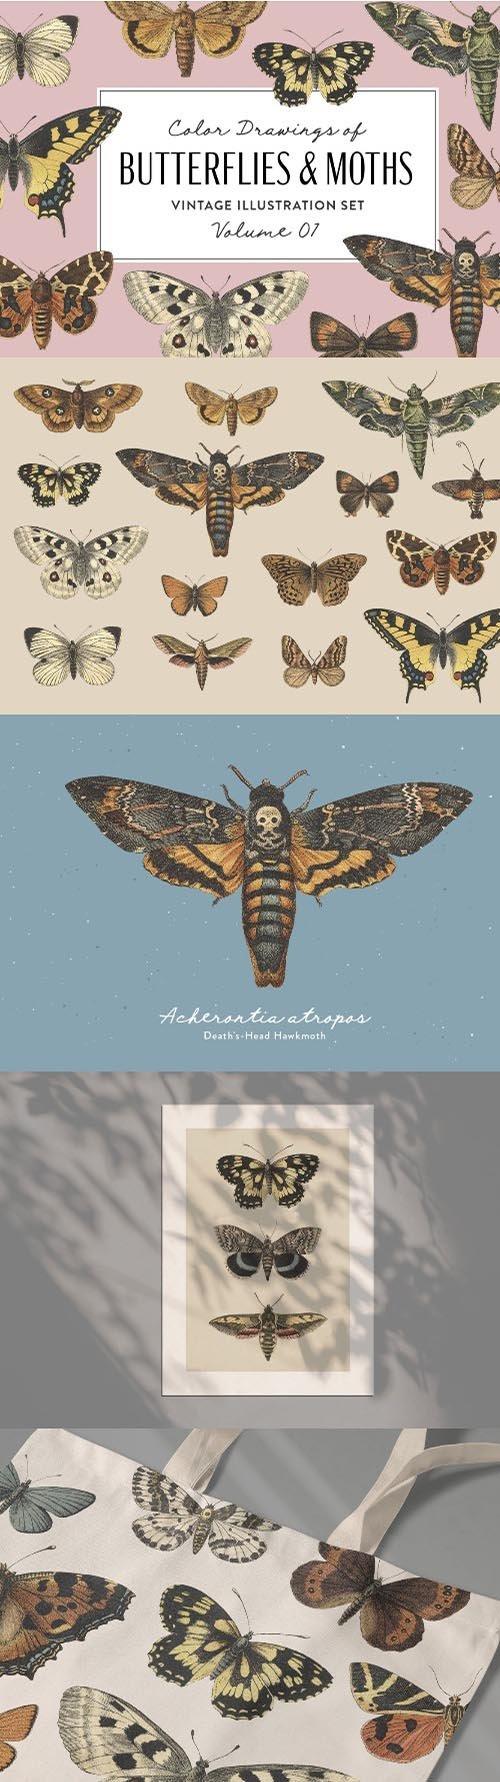 Butterflies & Moths Vintage Graphics Vol. 1 PNG